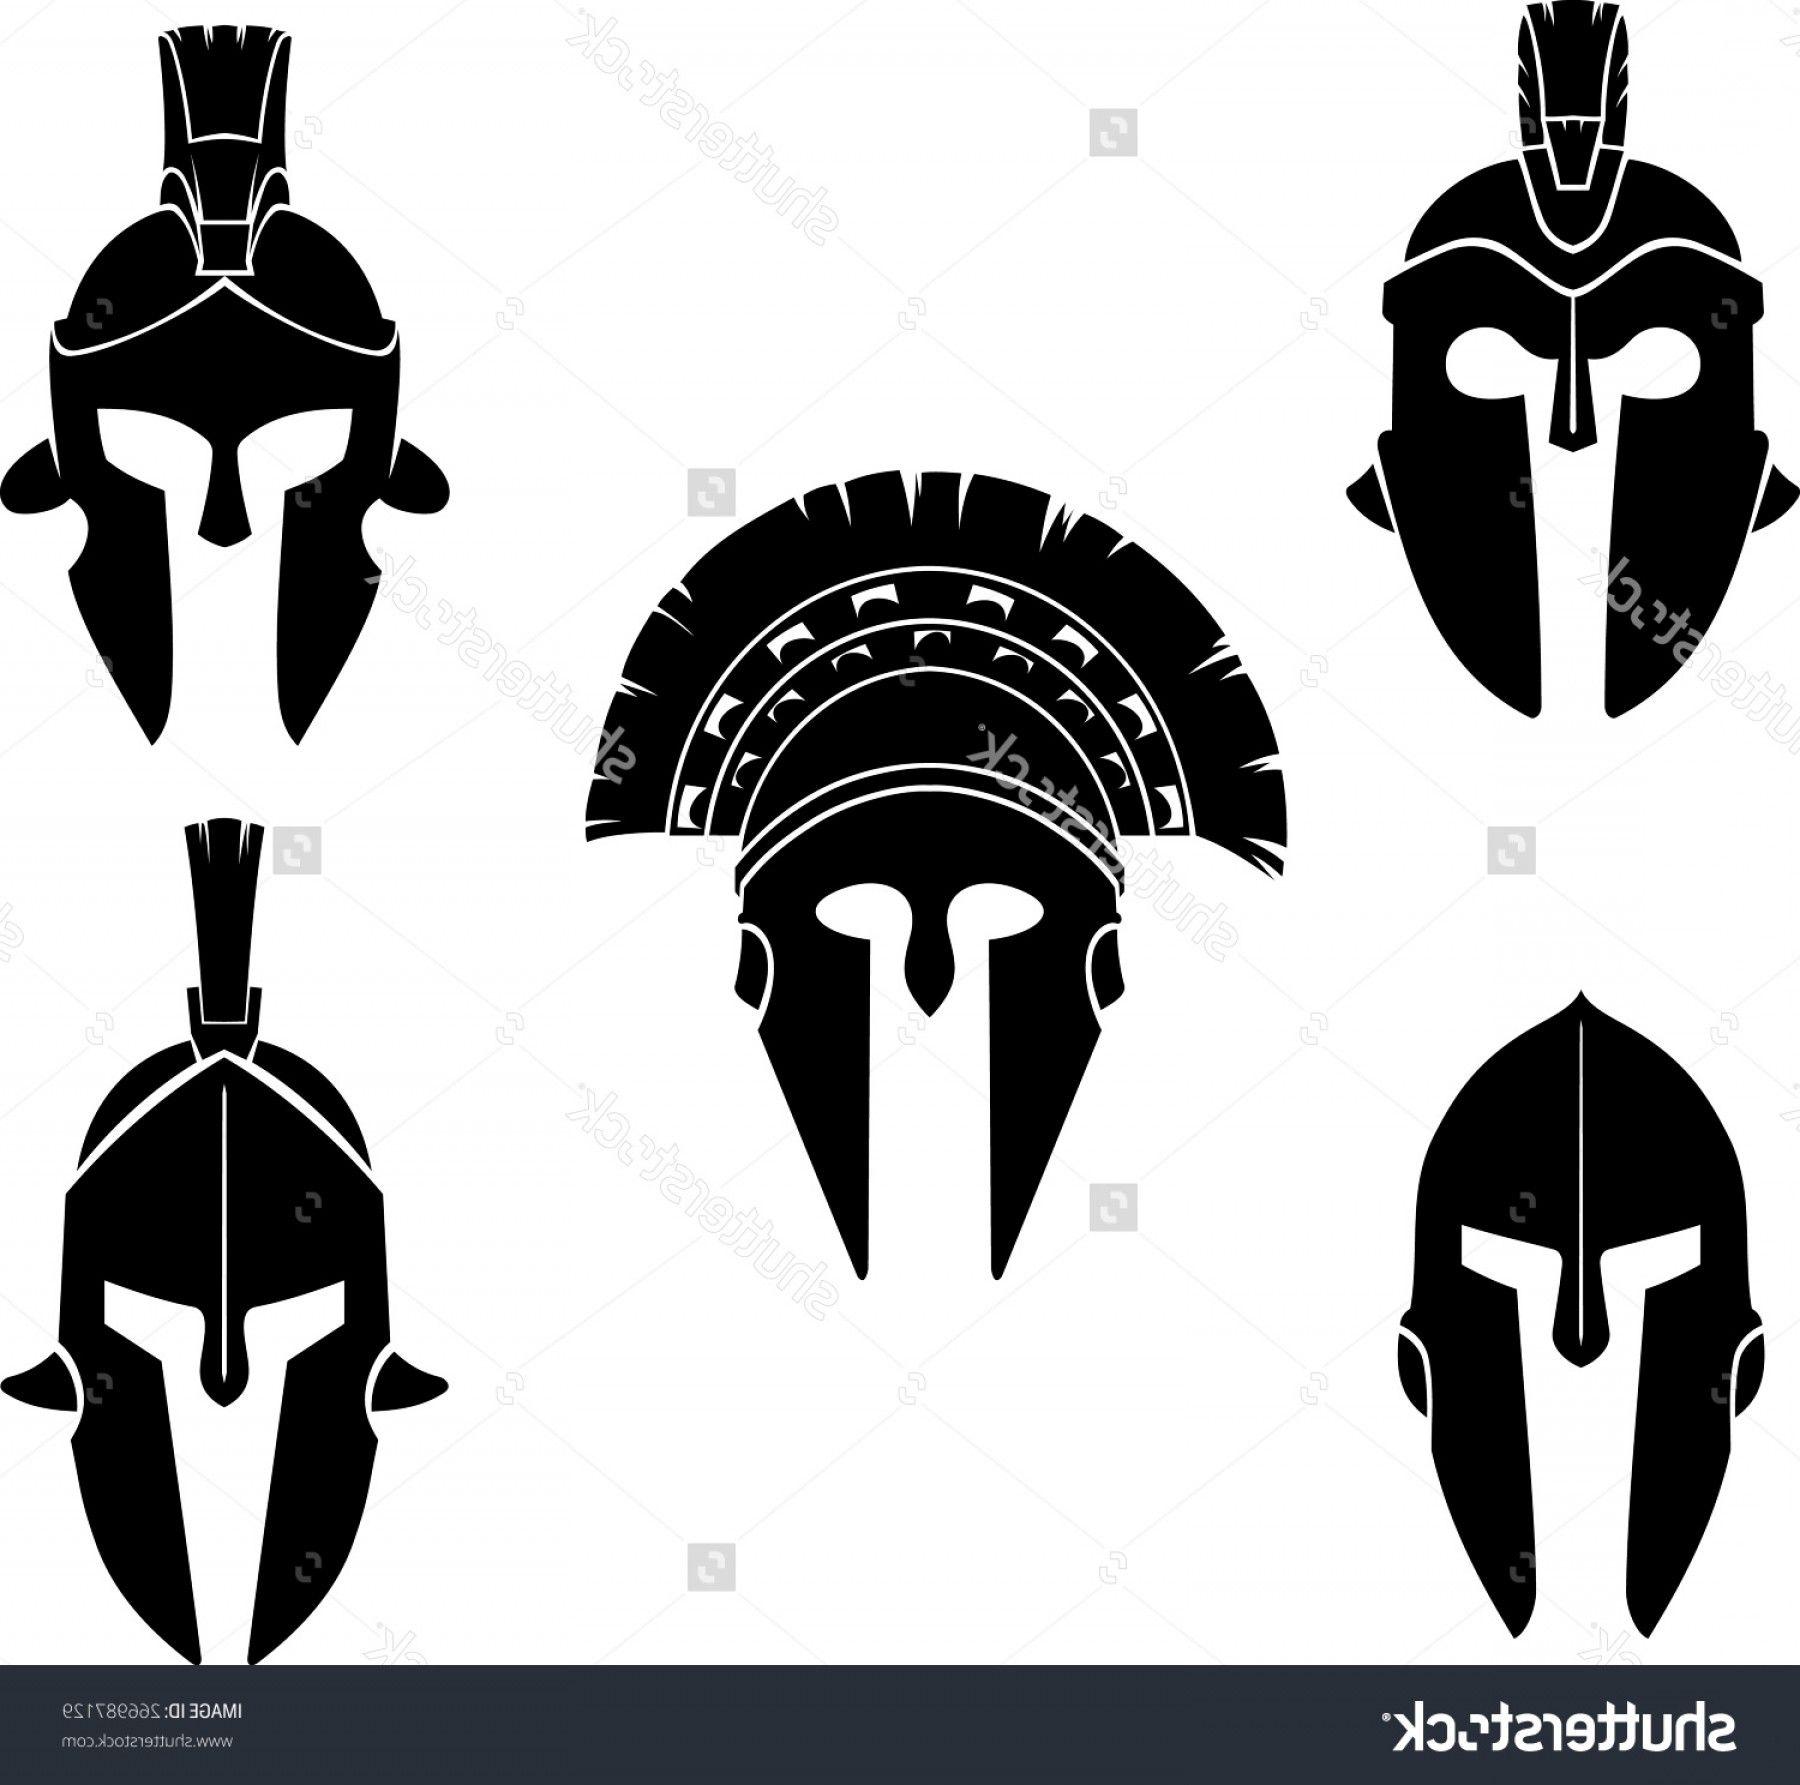 Sparta logo clipart graphic freeuse stock Excellent Spartan Vector Art Draw: HD Spartan Helmet Clip Art Black ... graphic freeuse stock